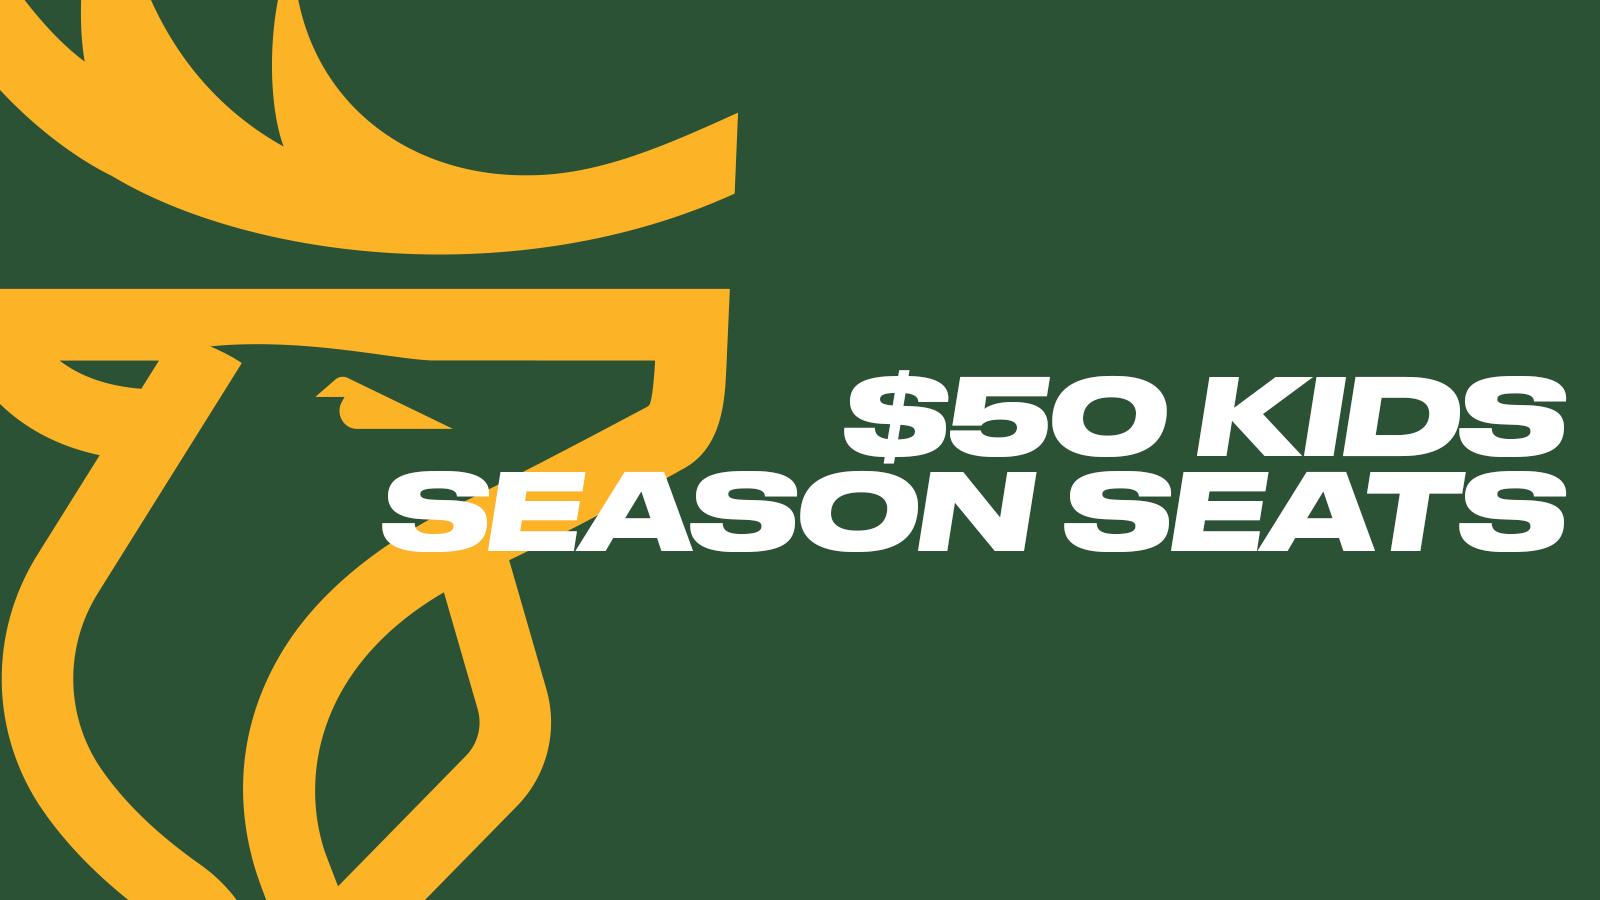 $50 Kids Season Seats